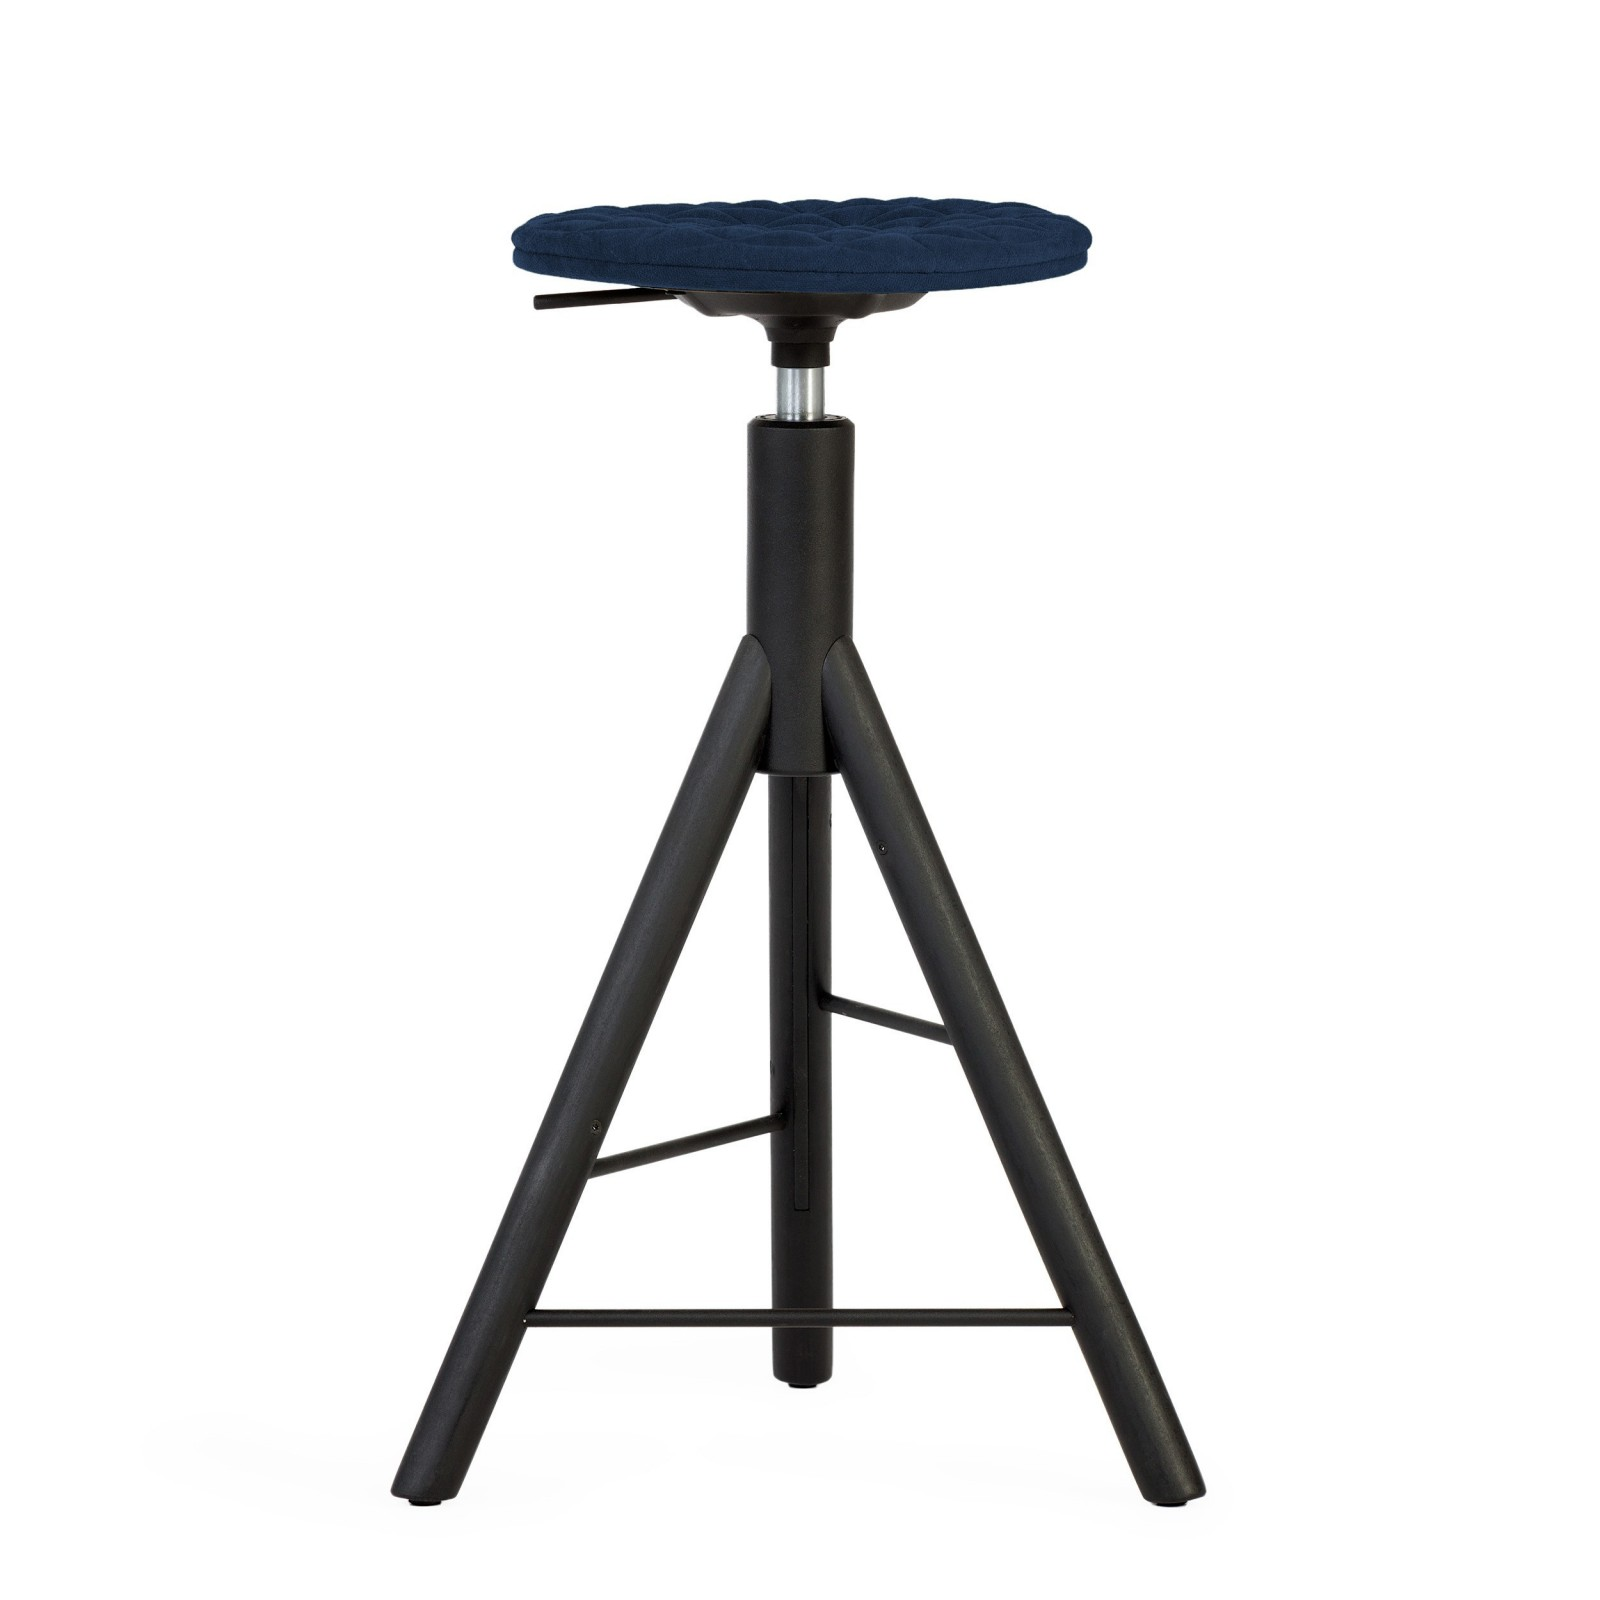 Krzesło barowe MannequinBar - 01 - granat